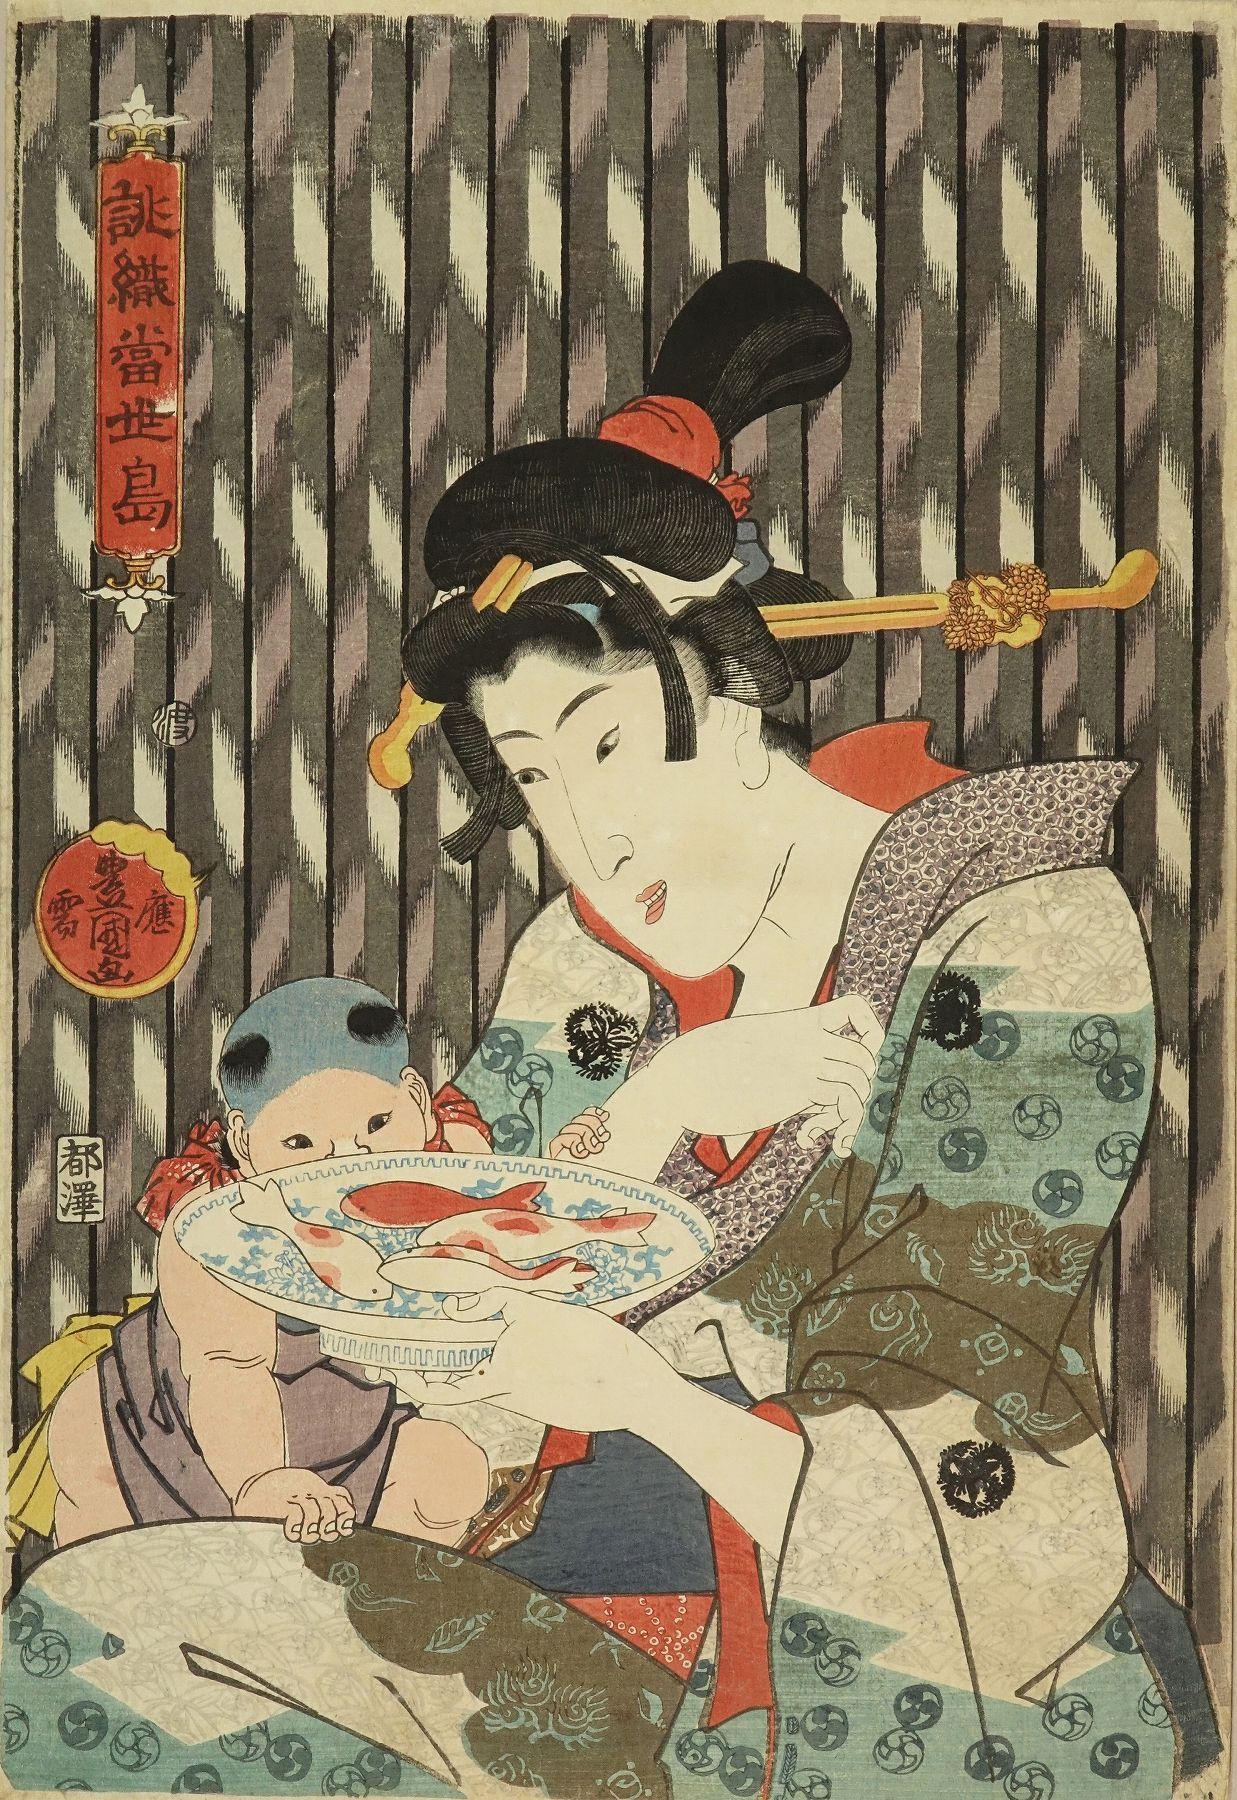 TOYOKUNI III Mother and baby looking at <i>Kinkato</i> (Goldfish candy), from <i>Atsurae some tosei shima</i> (Fashionable striped fabrics made to order)